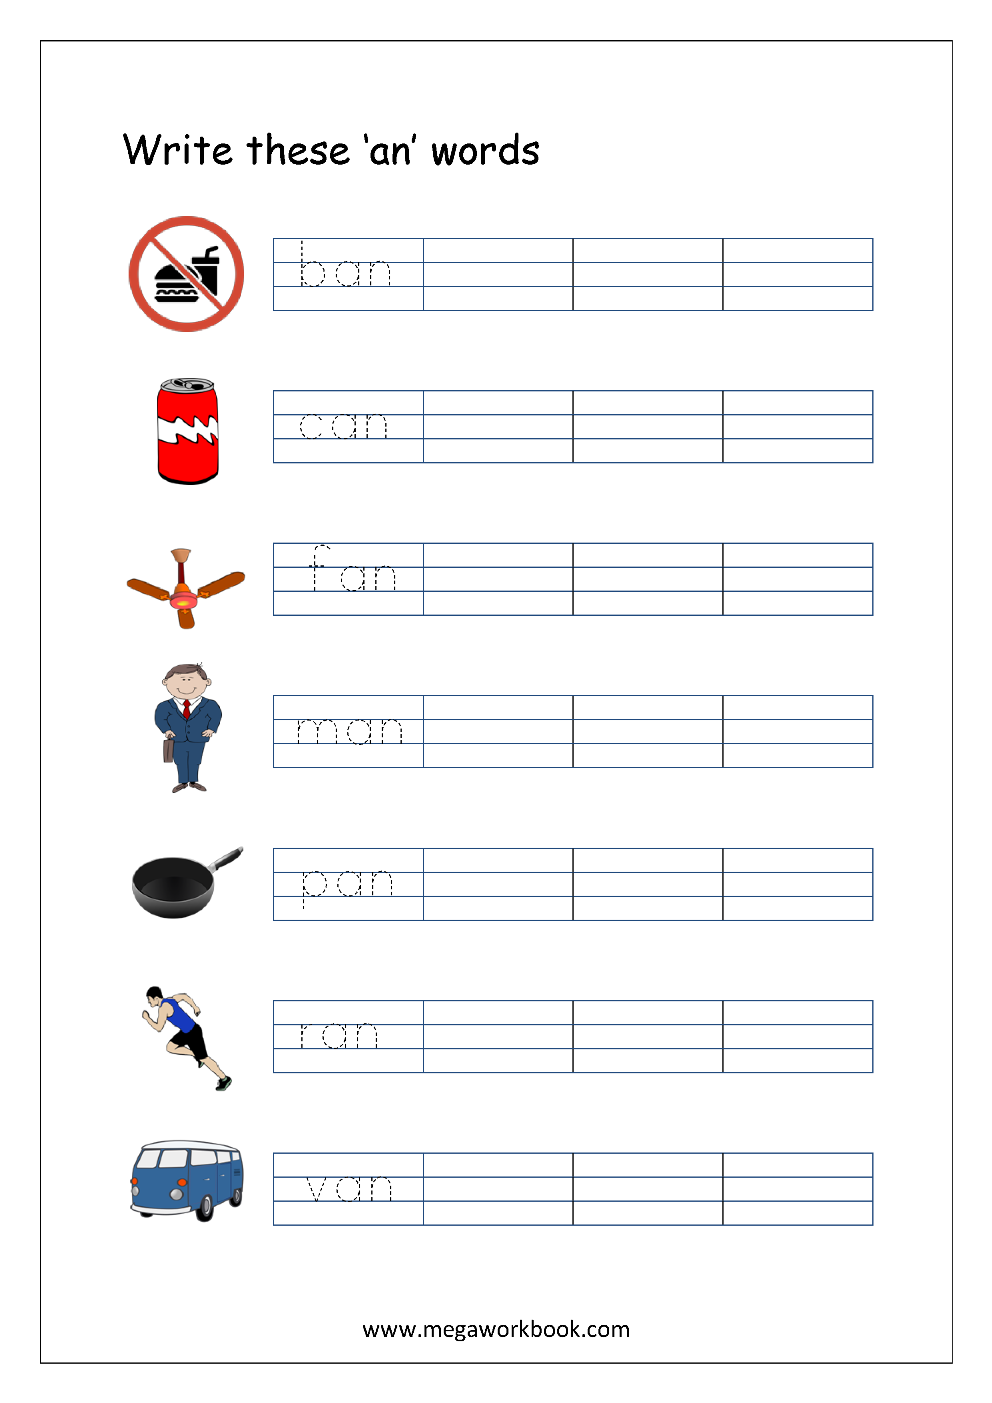 free printable cvc words writing worksheets for kids three letter rhyming words for. Black Bedroom Furniture Sets. Home Design Ideas